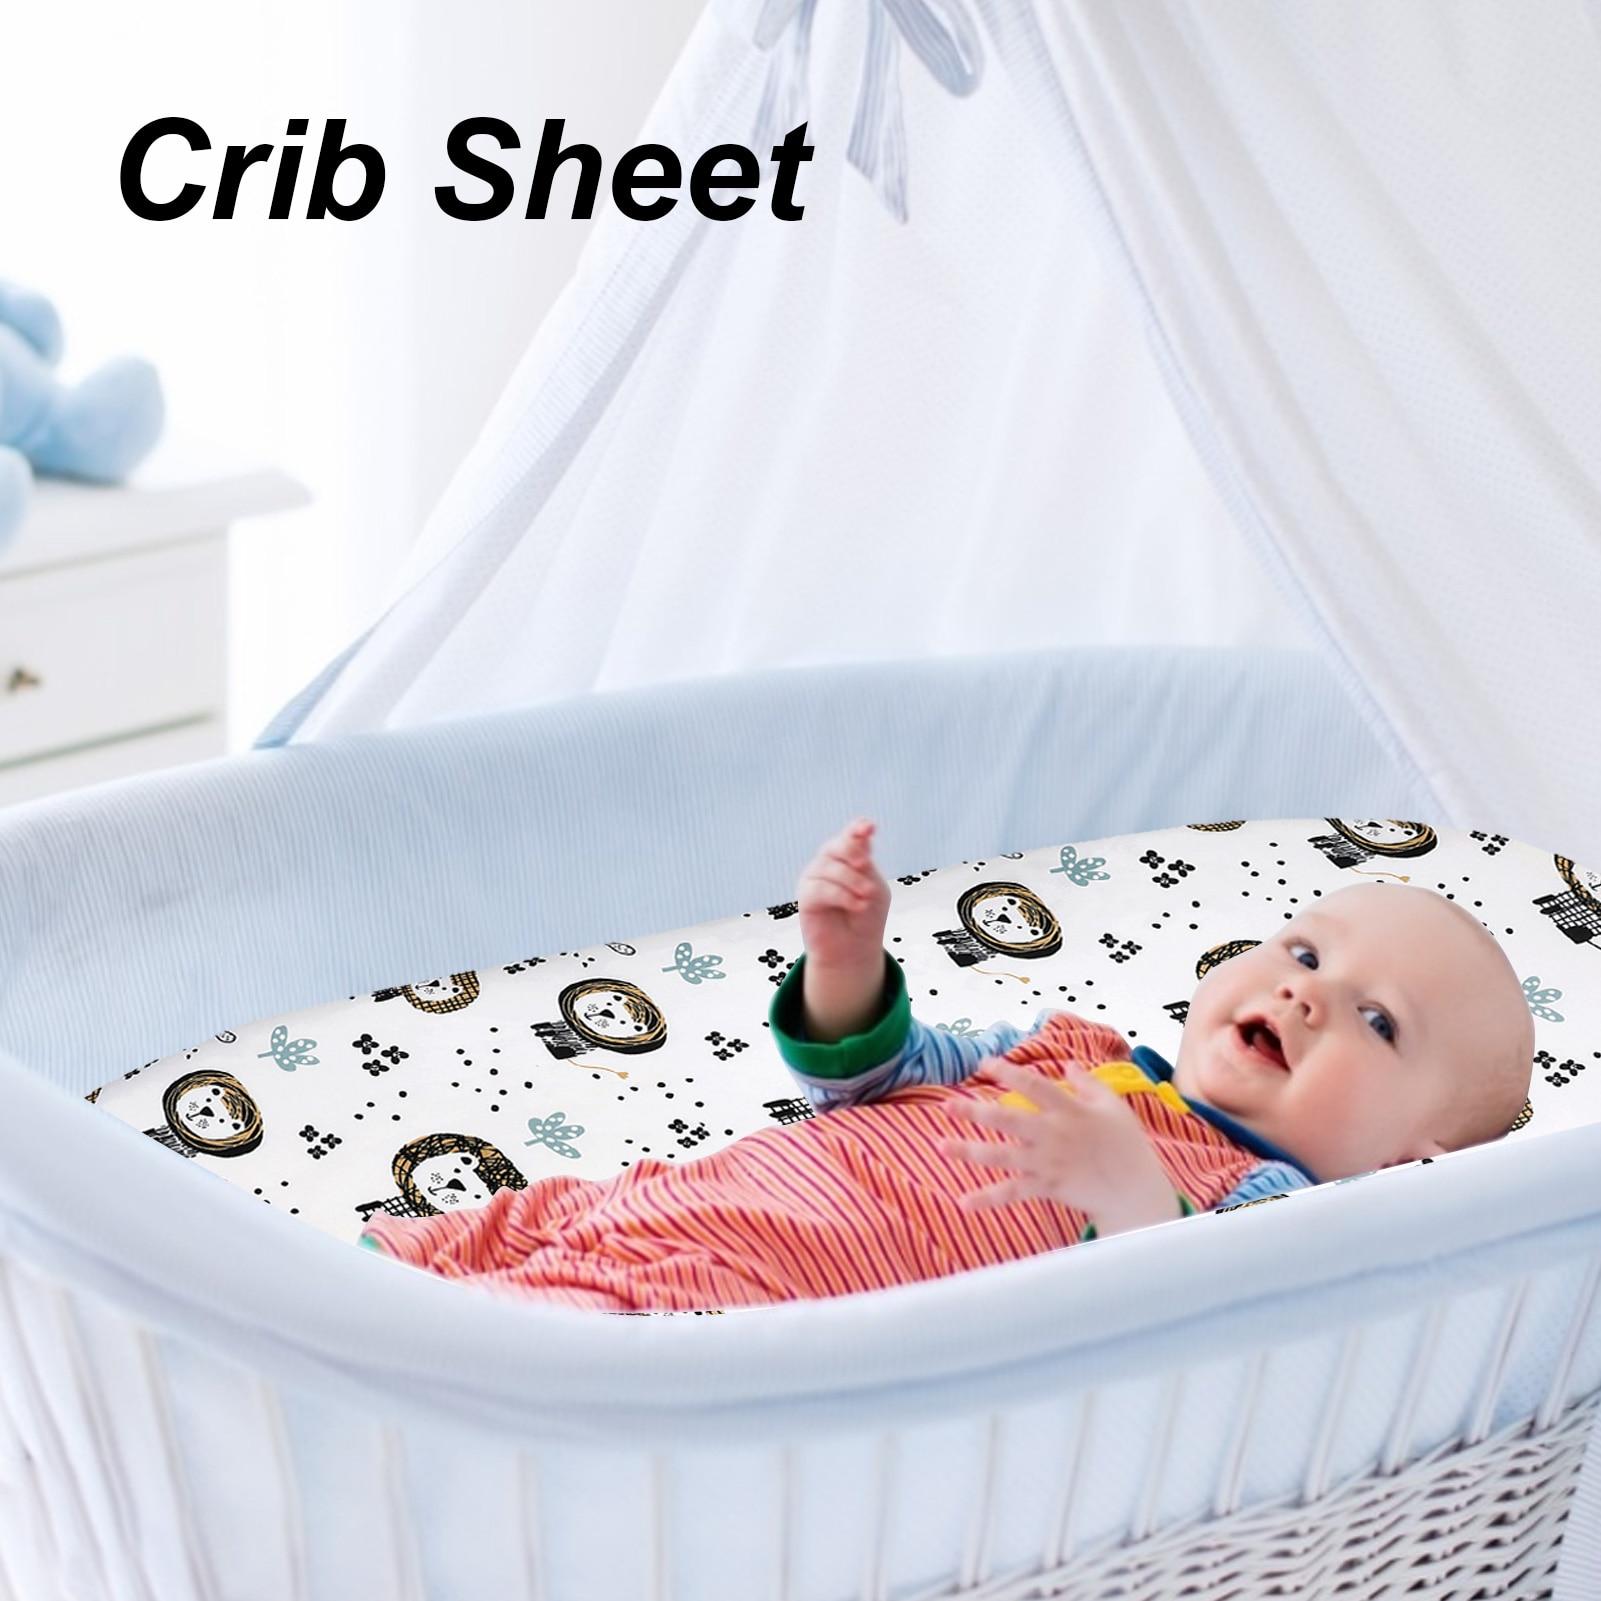 Baby Fitted Sheet For Newborns Cotton Soft Crib Bed Sheet For Children Mattress Covers Newborn Toddler Bedding Set